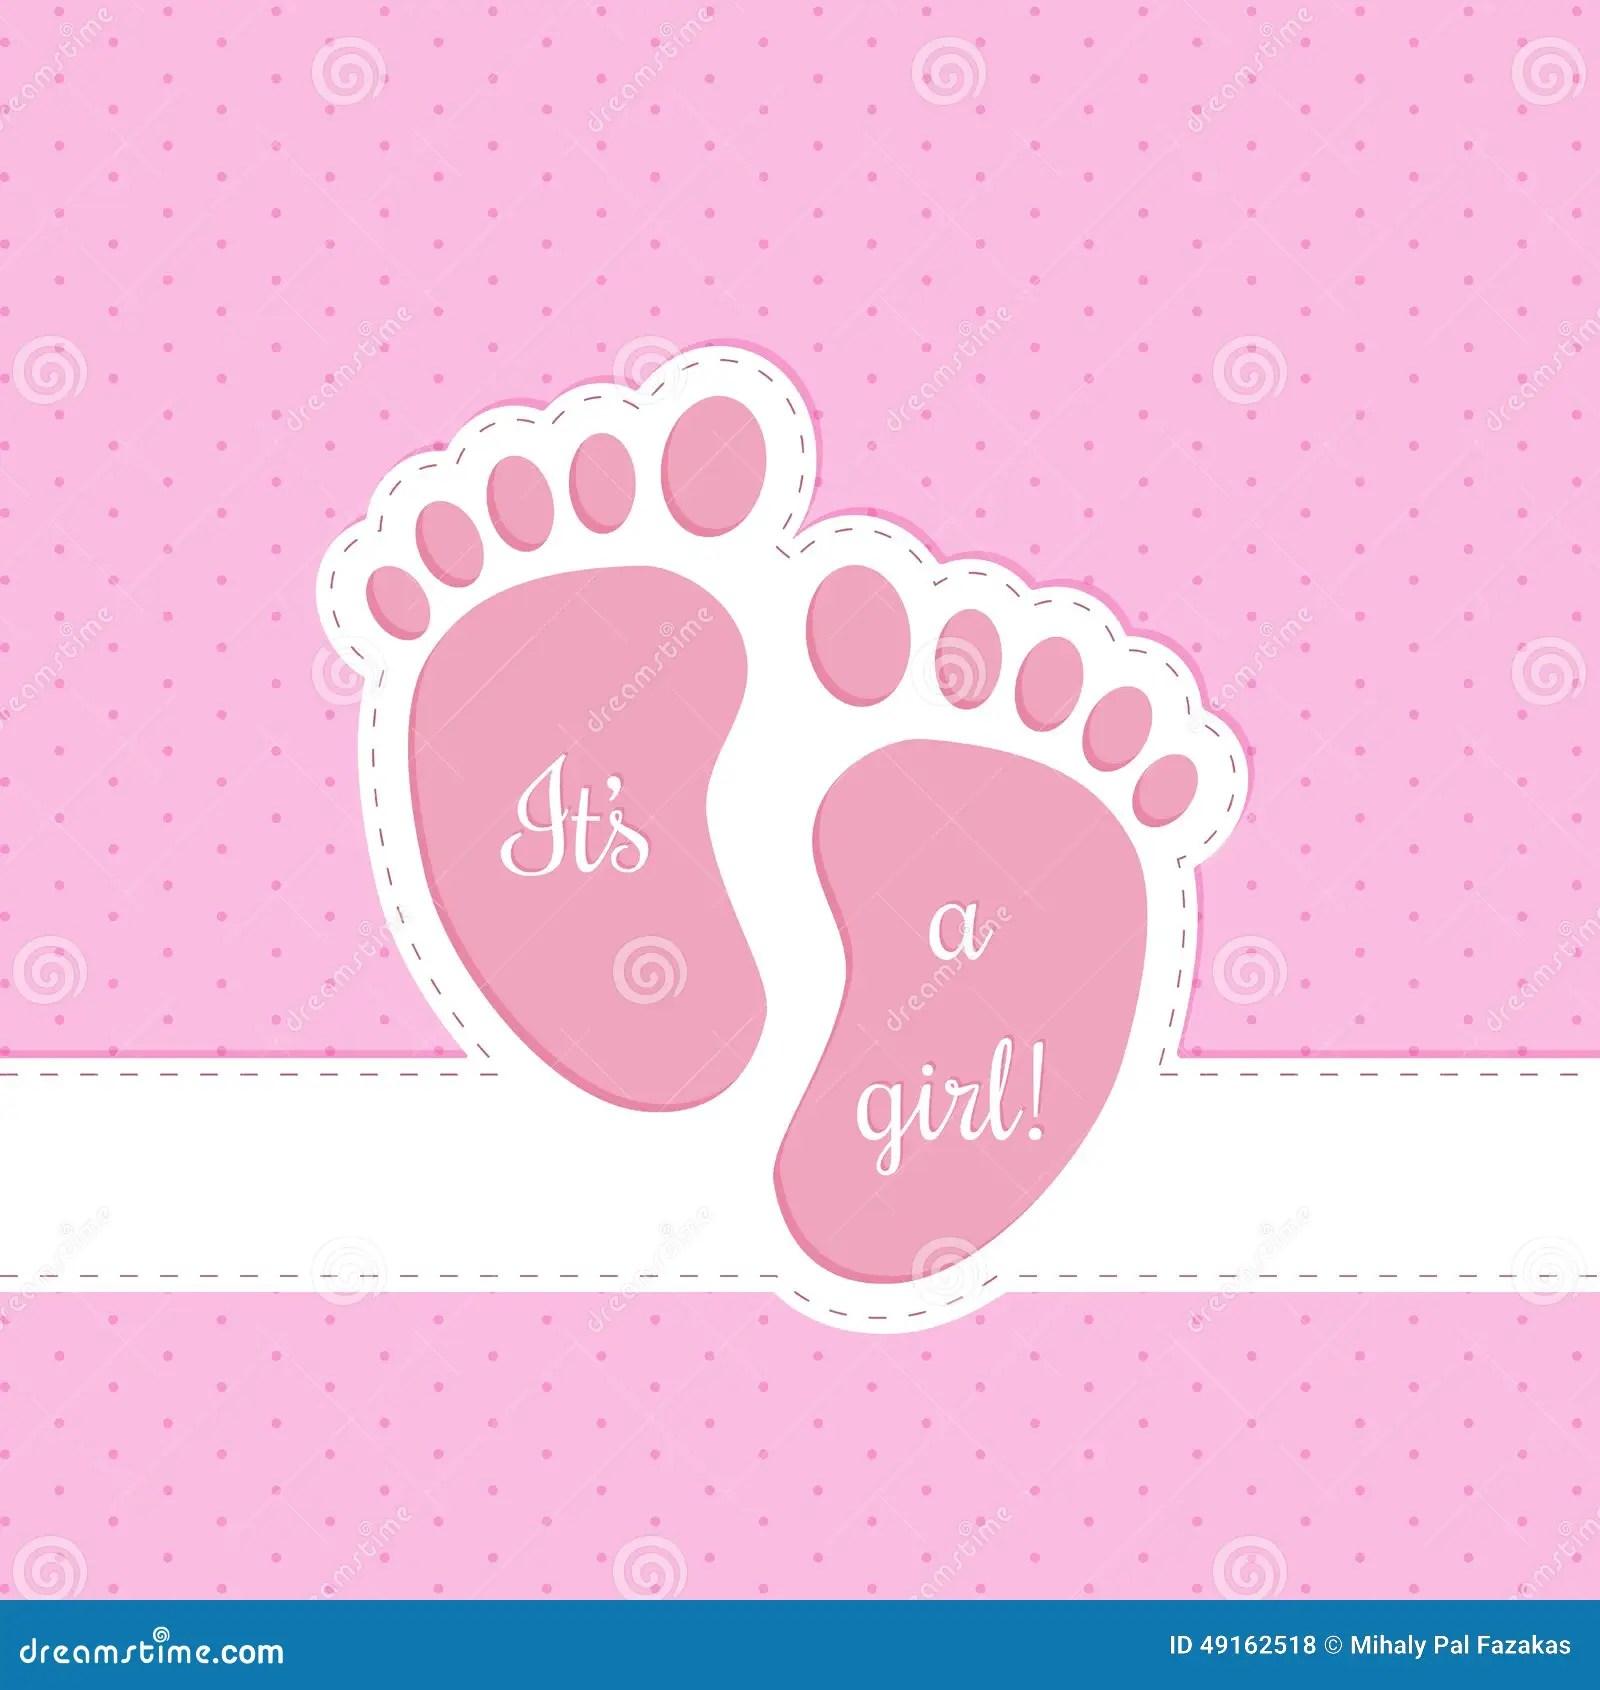 Sample Baby Shower Invitation Card